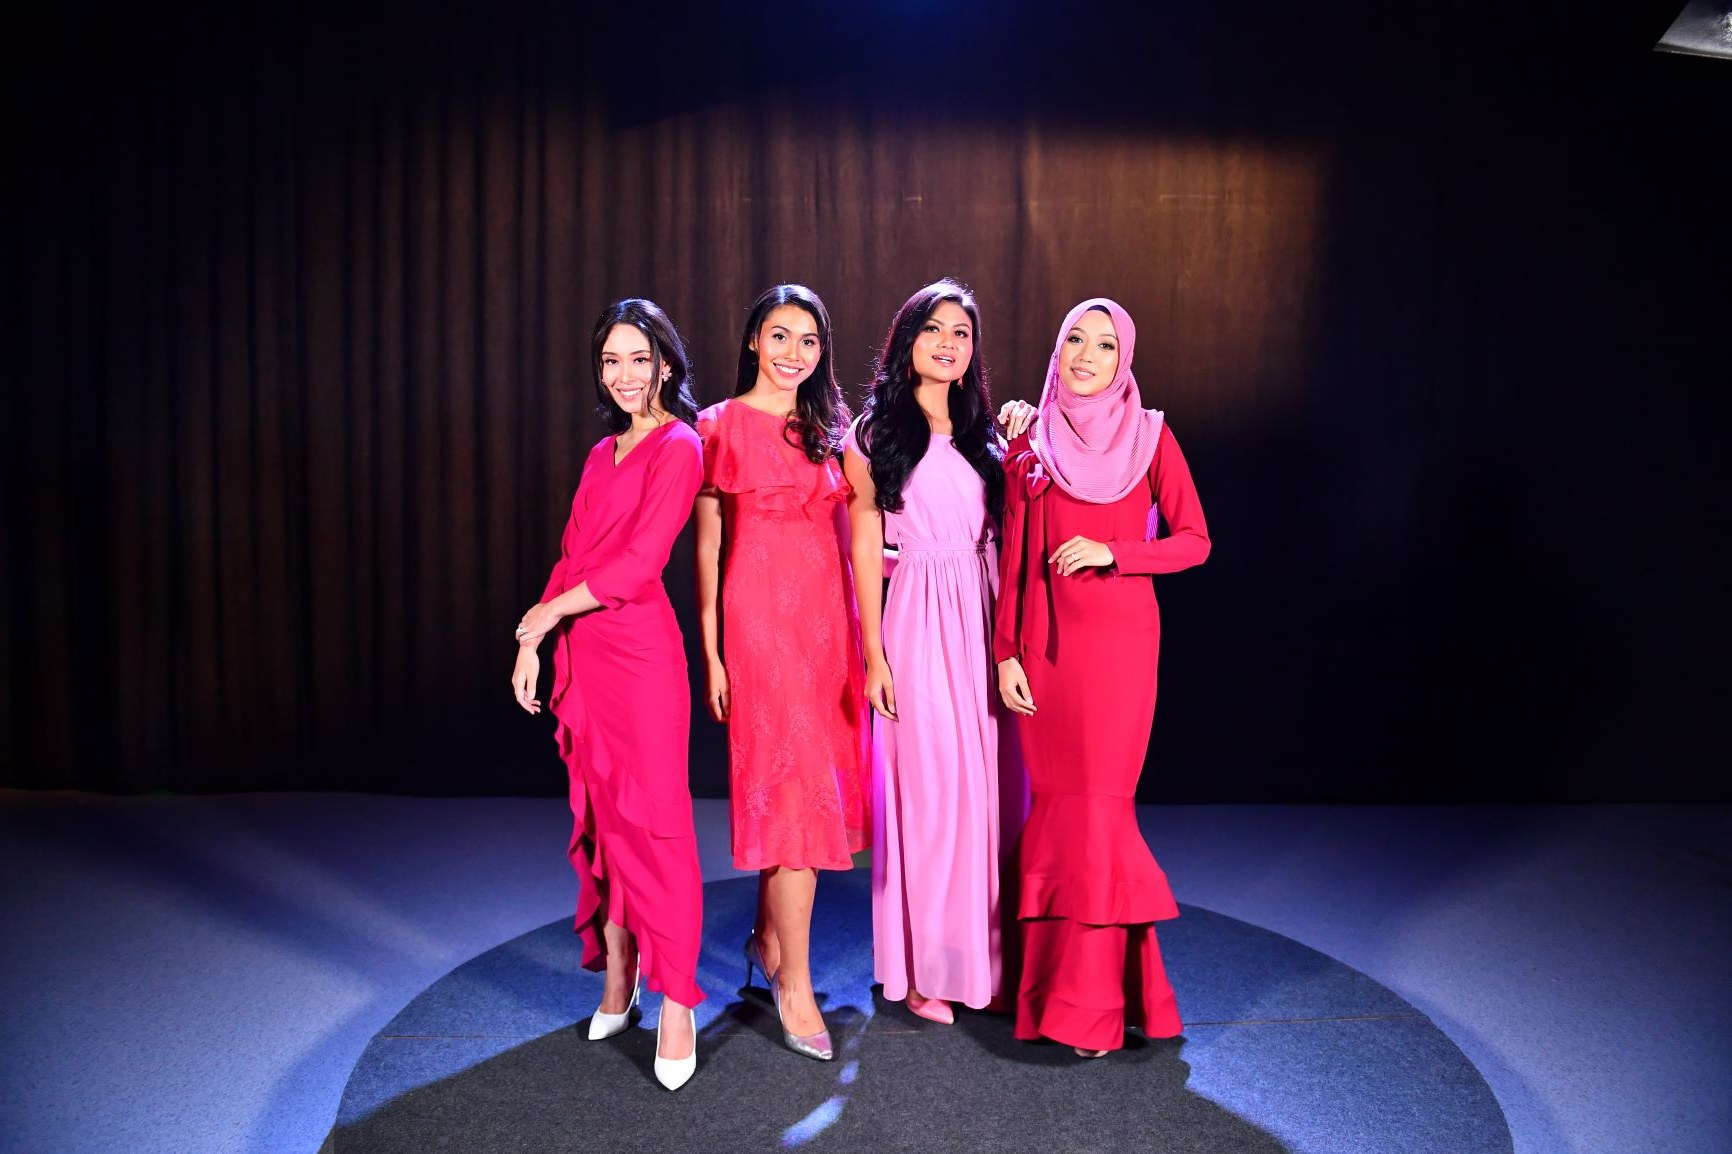 Design Gaun Pengantin Muslim Cantik Xtd6 Portal Rasmi Jabatan Penyiaran Malaysia